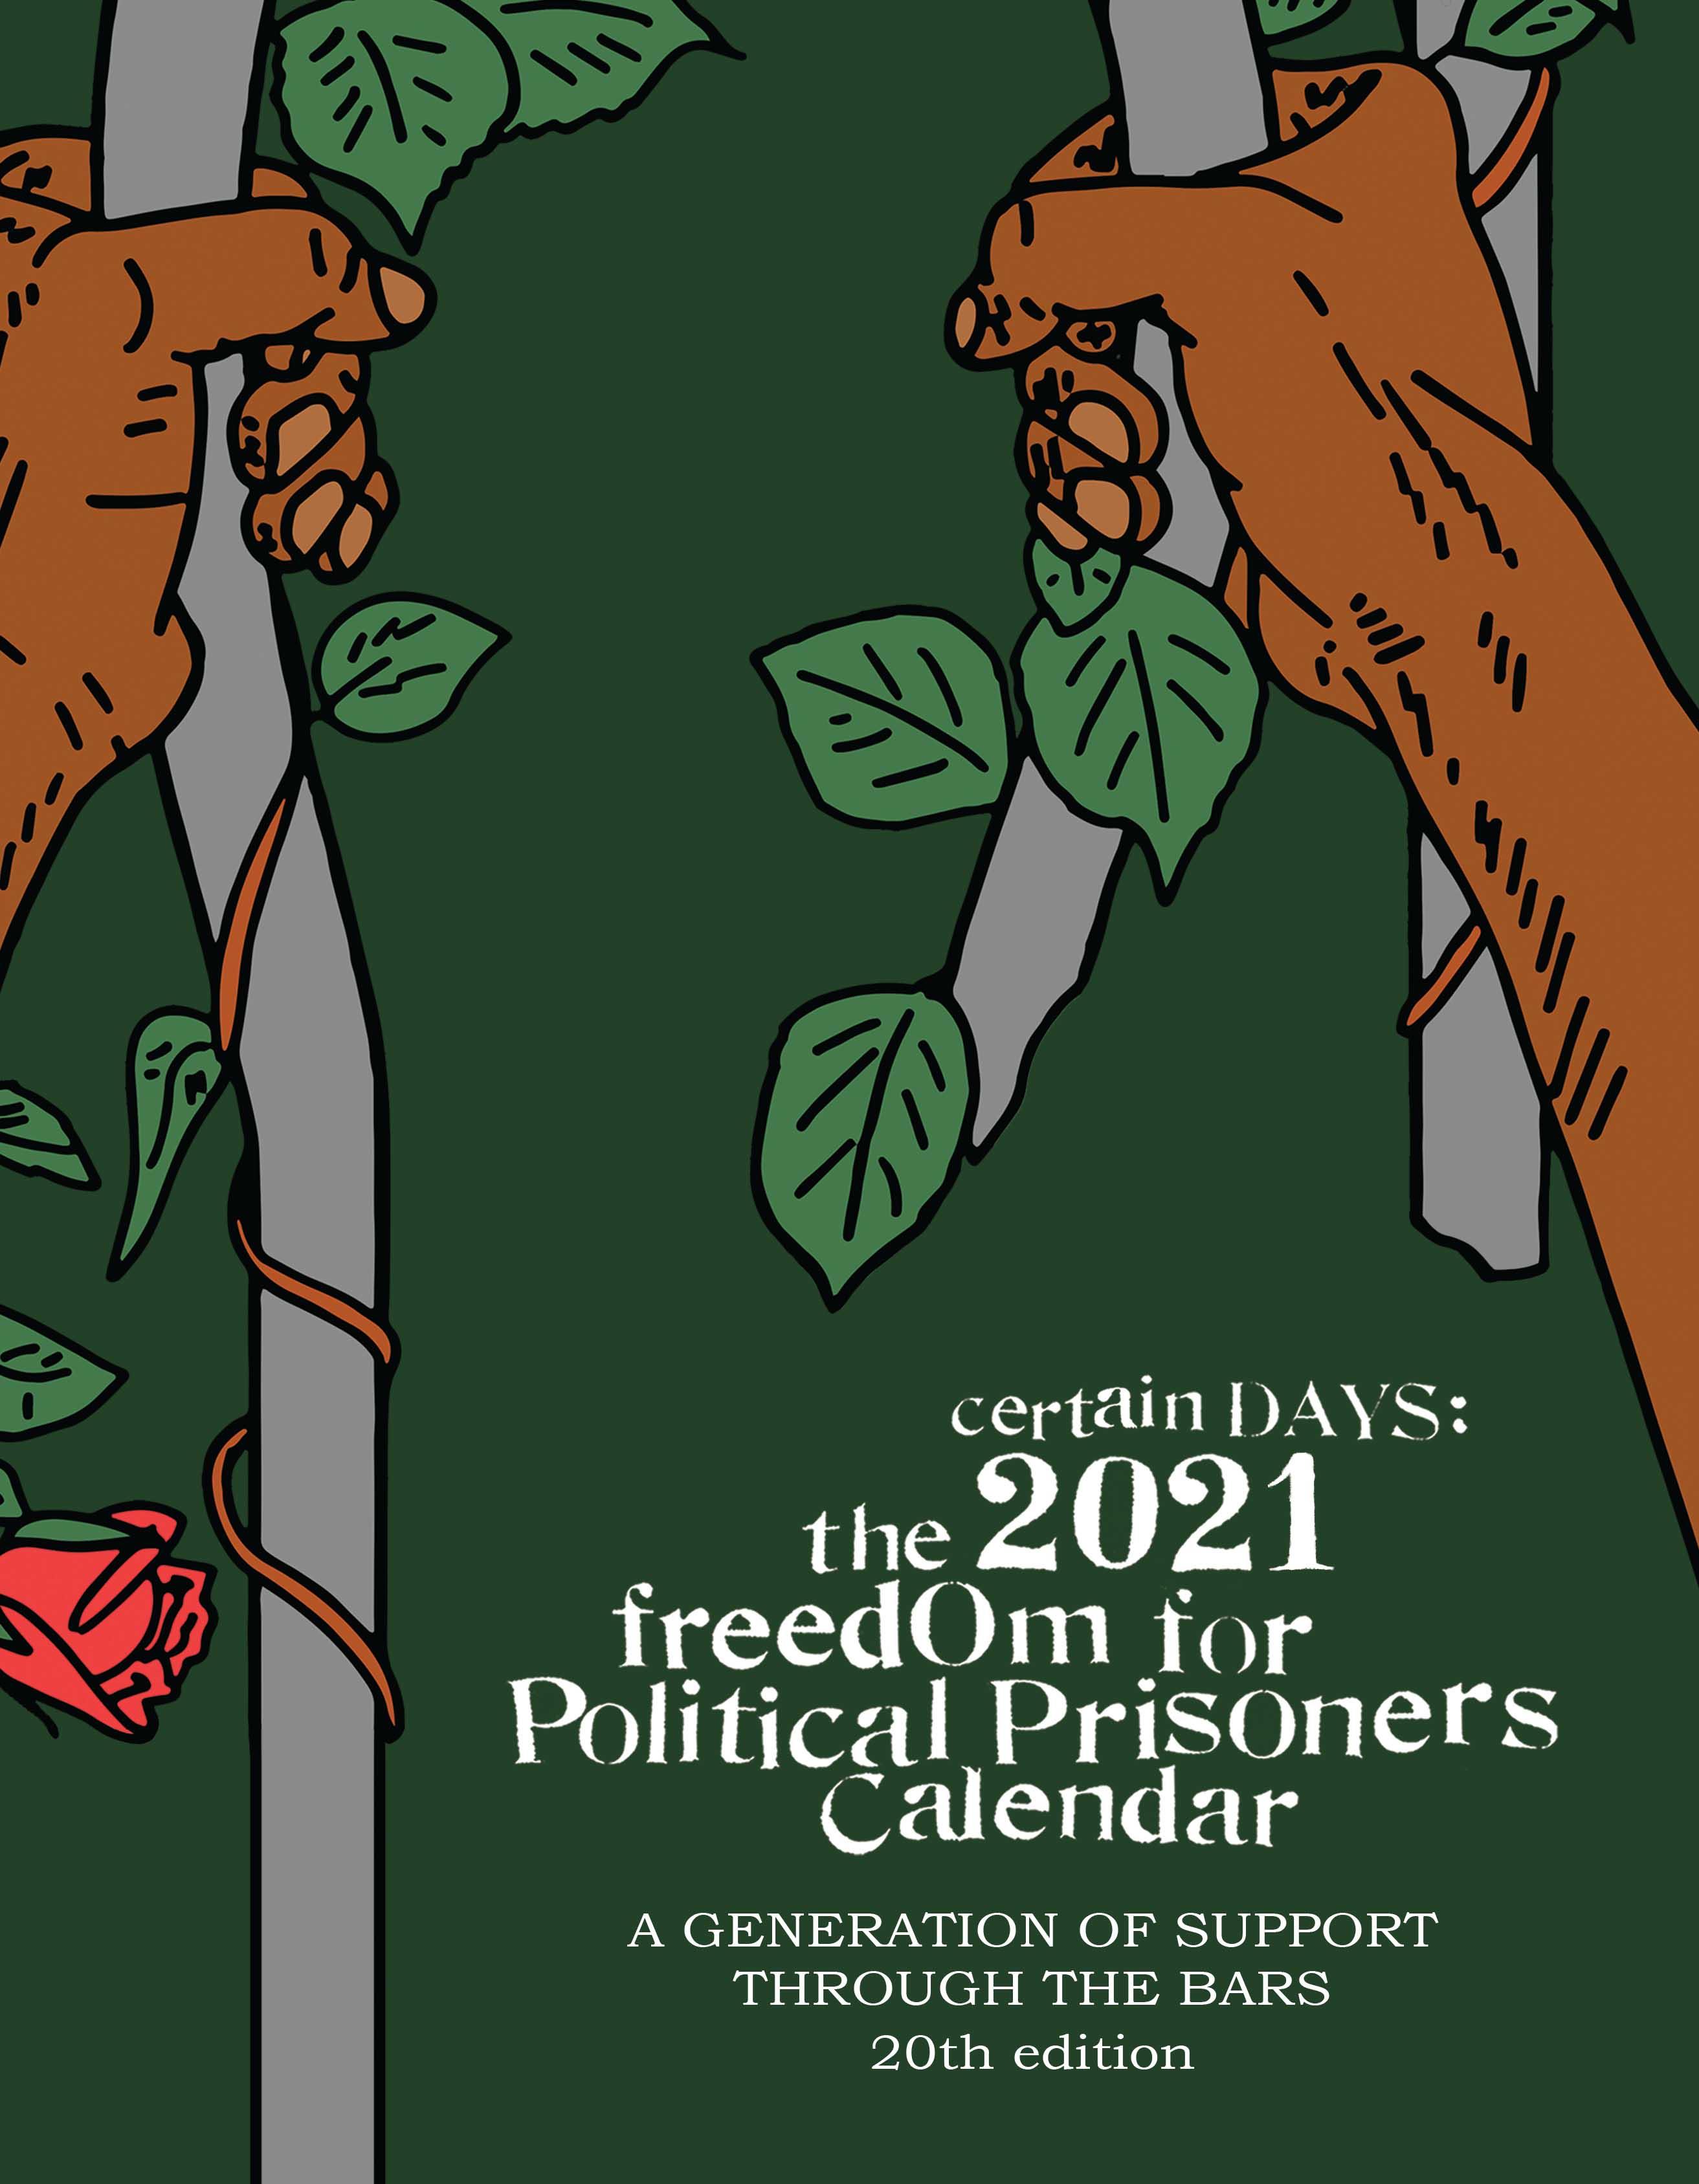 Freedom Calendar 2021 - United States Map